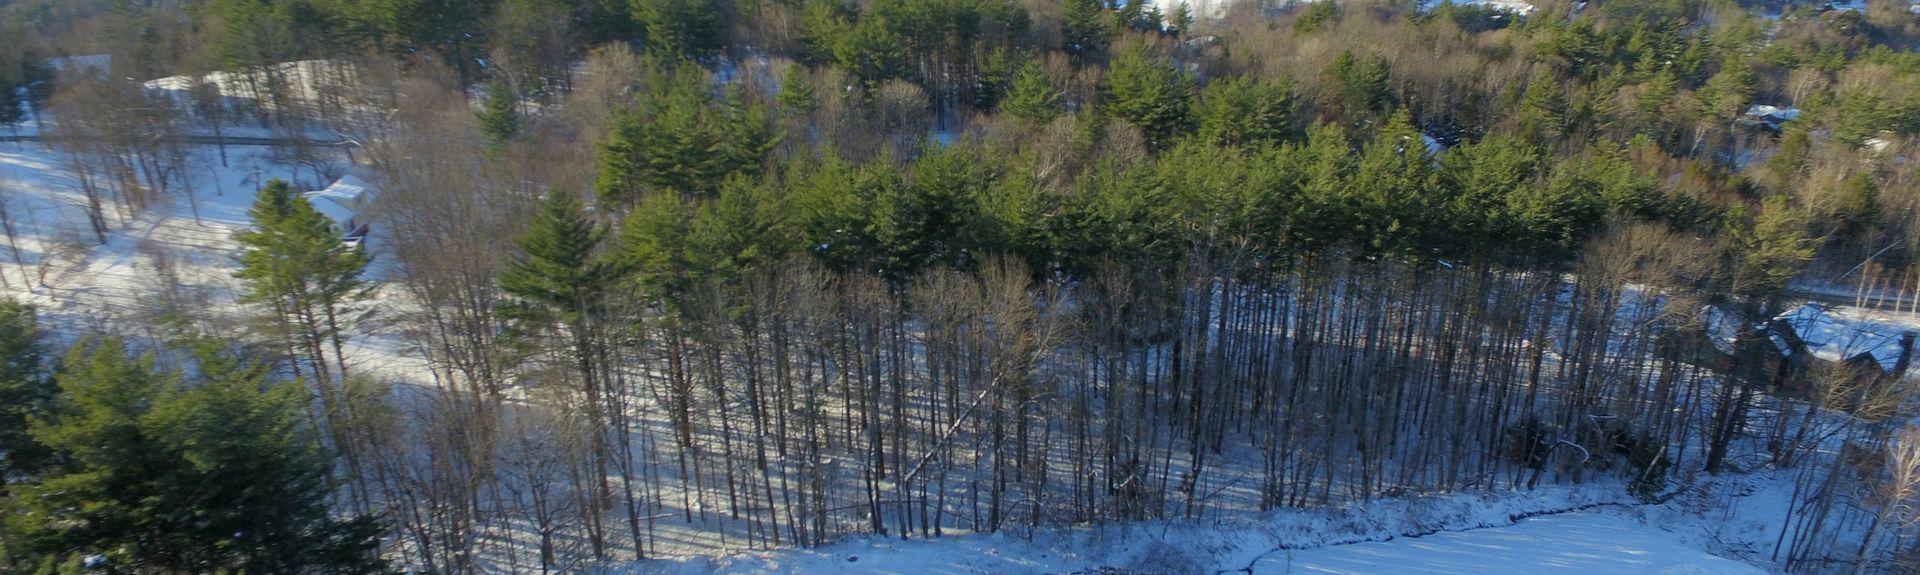 Holy Resurrection Orthodox Church, Claremont, New Hampshire, United States of America